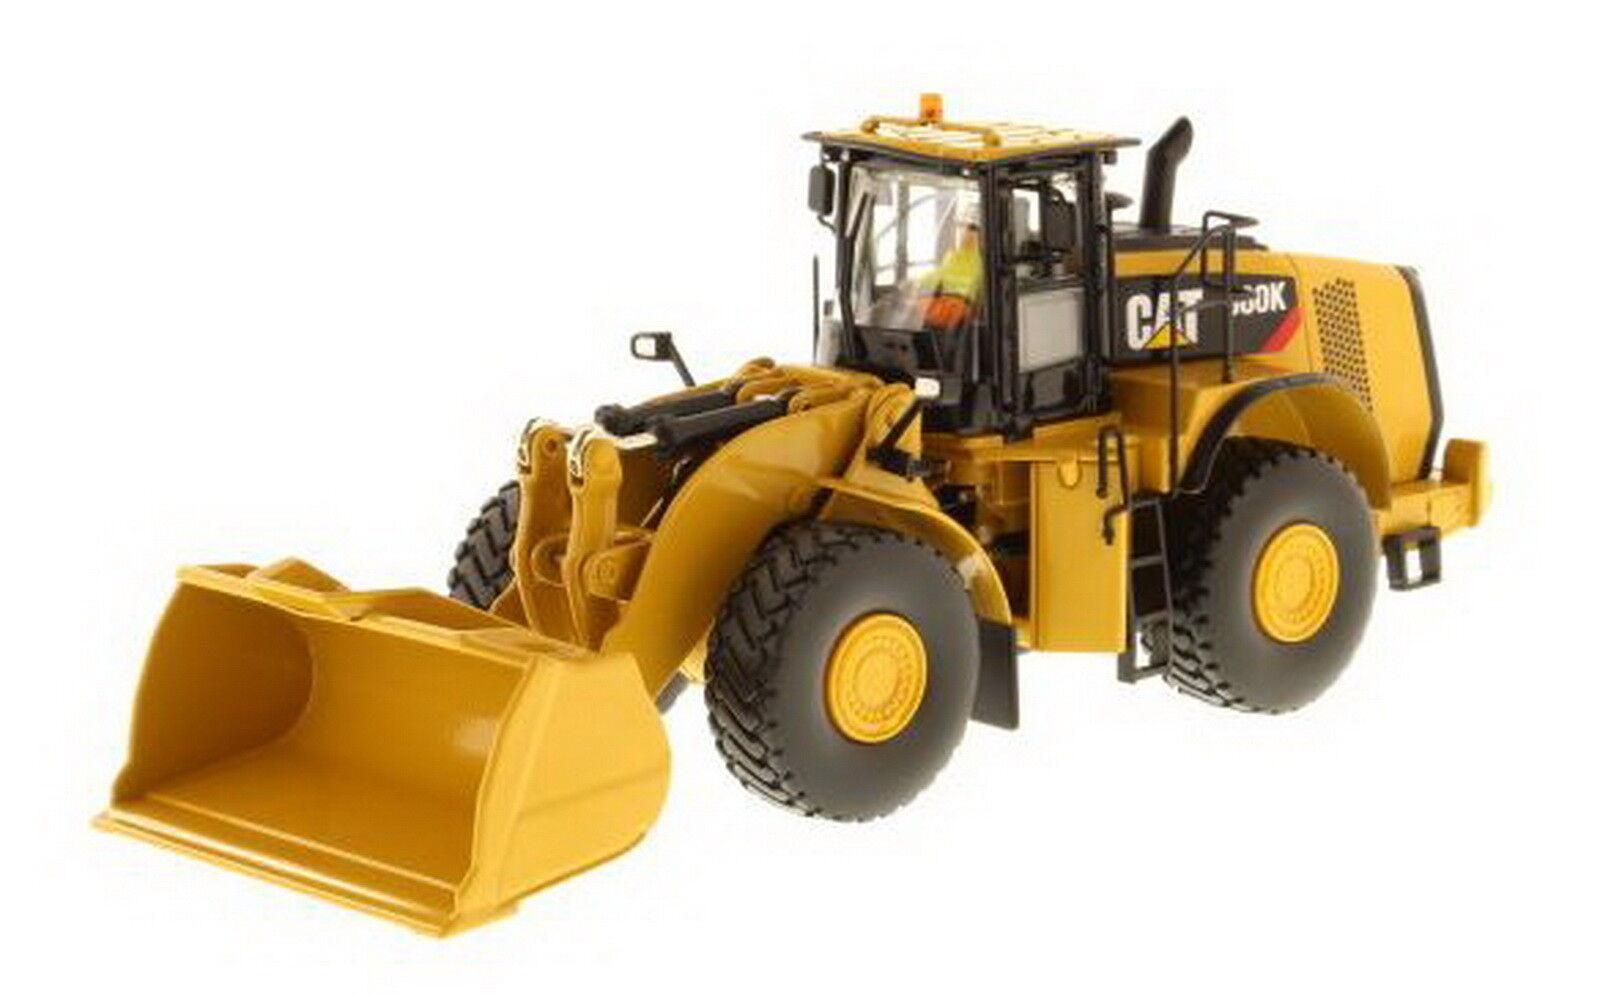 1/50 DM Cat 980K Wheel Loader Material Handling Configuration Diecast